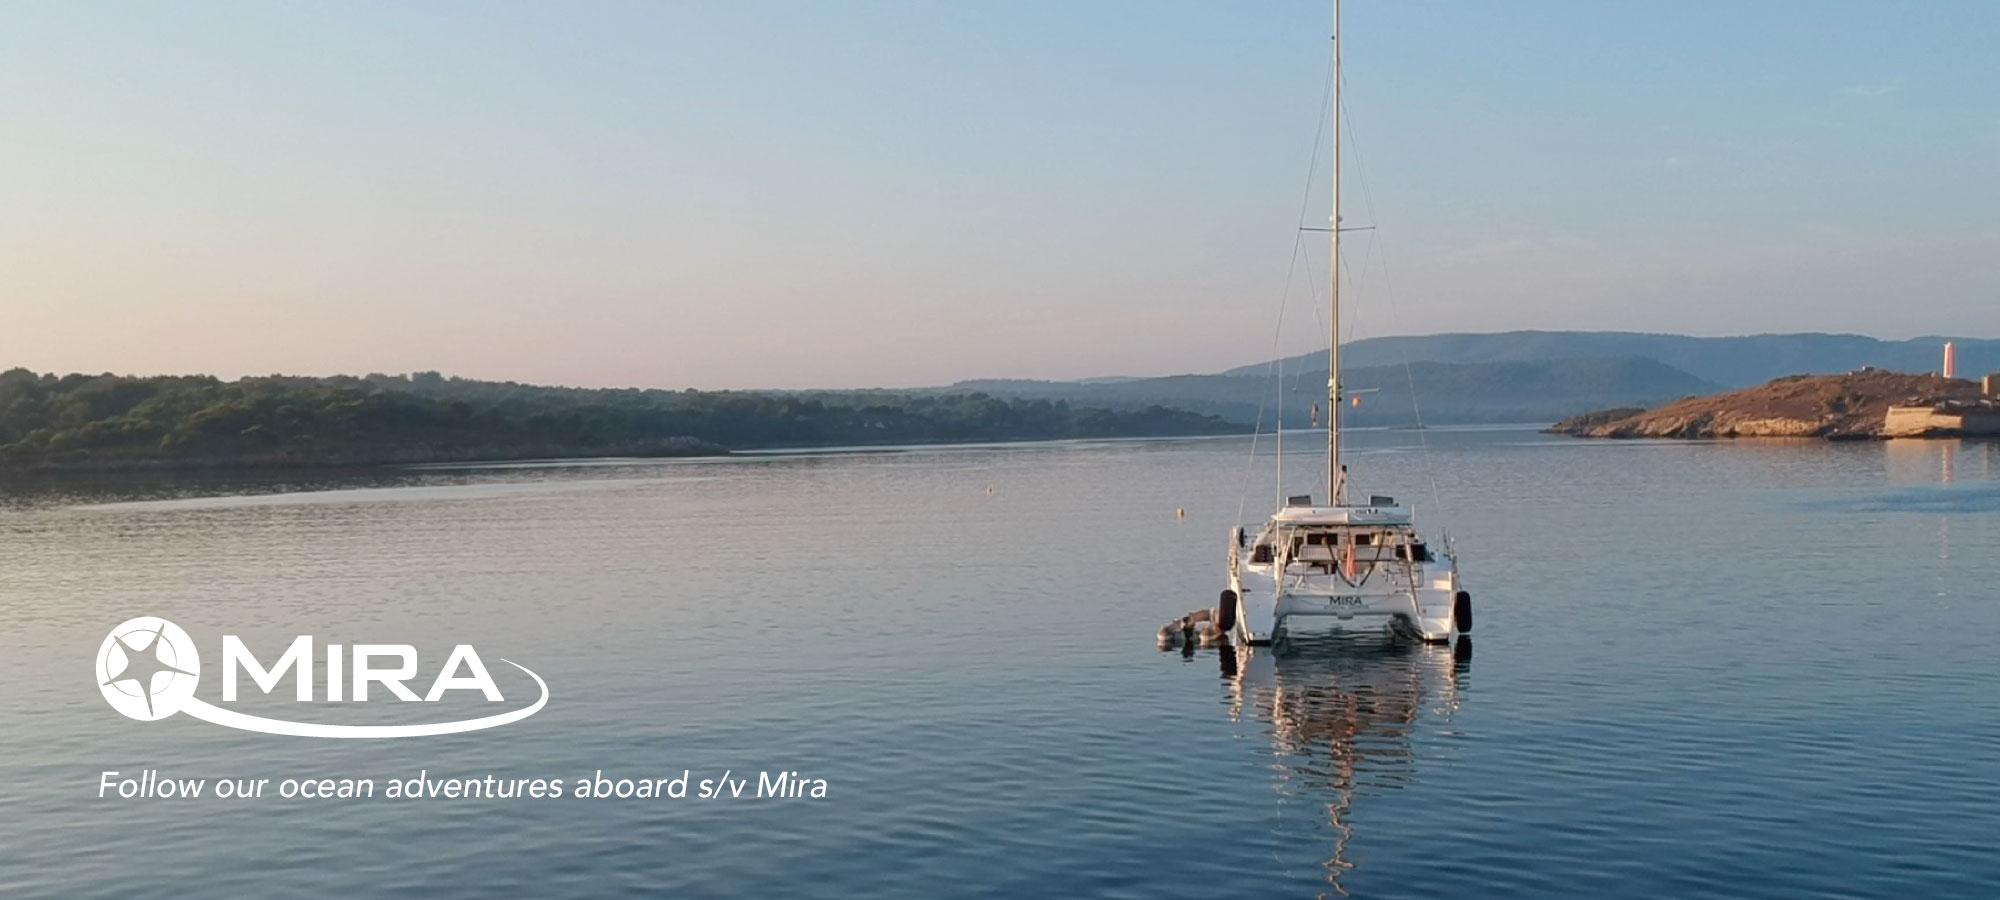 Mira catamaran blog